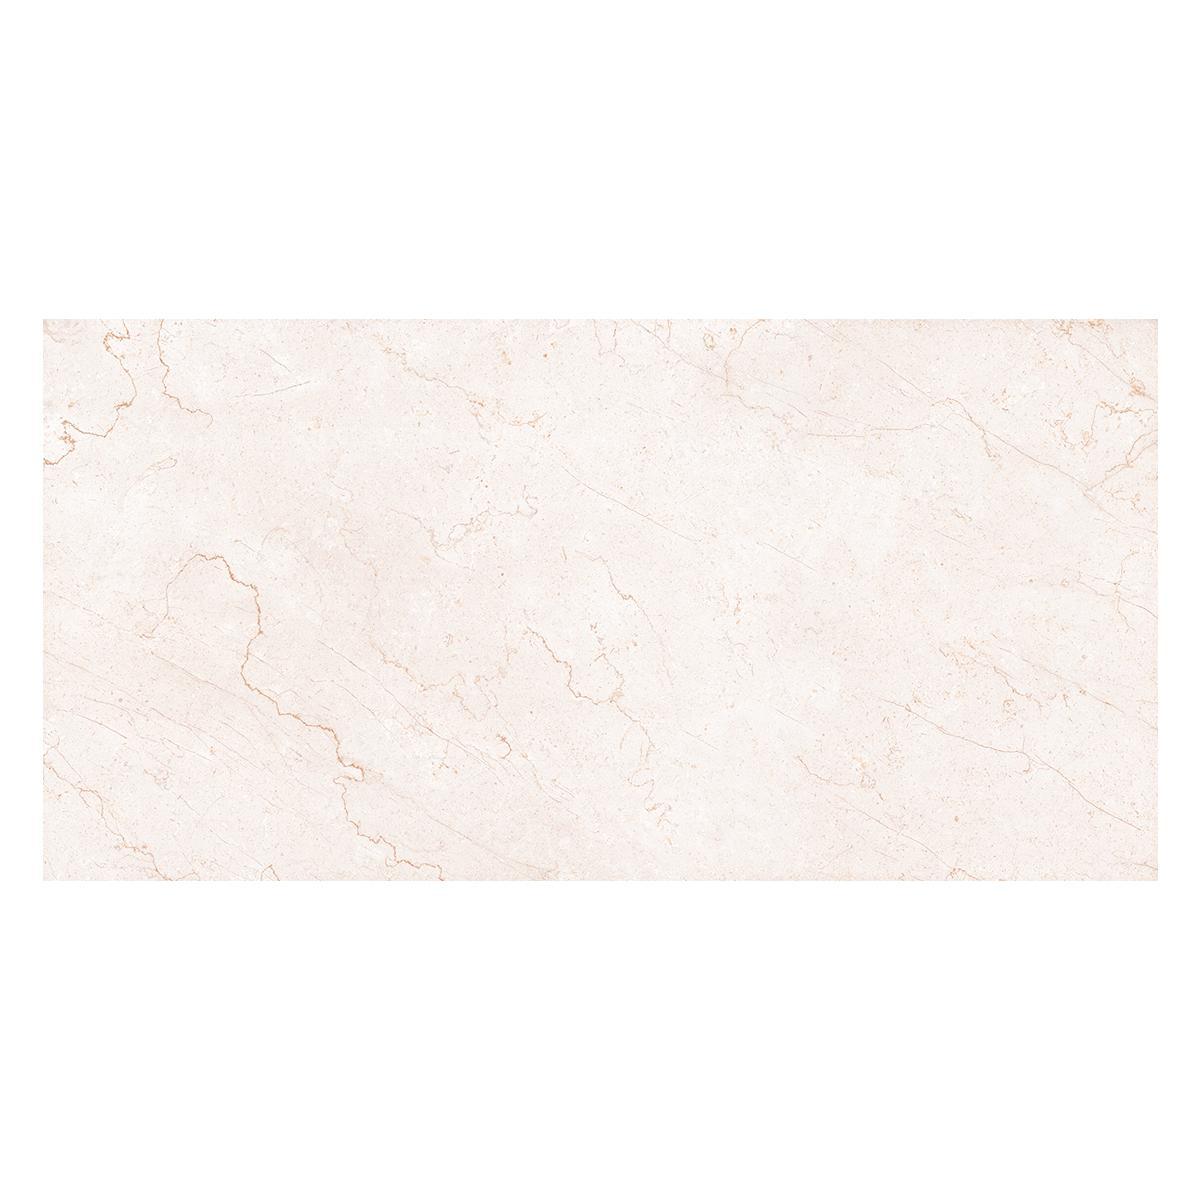 Porcelanato Sarca Hueso Brillante - 60X120 cm - 1.44 m2